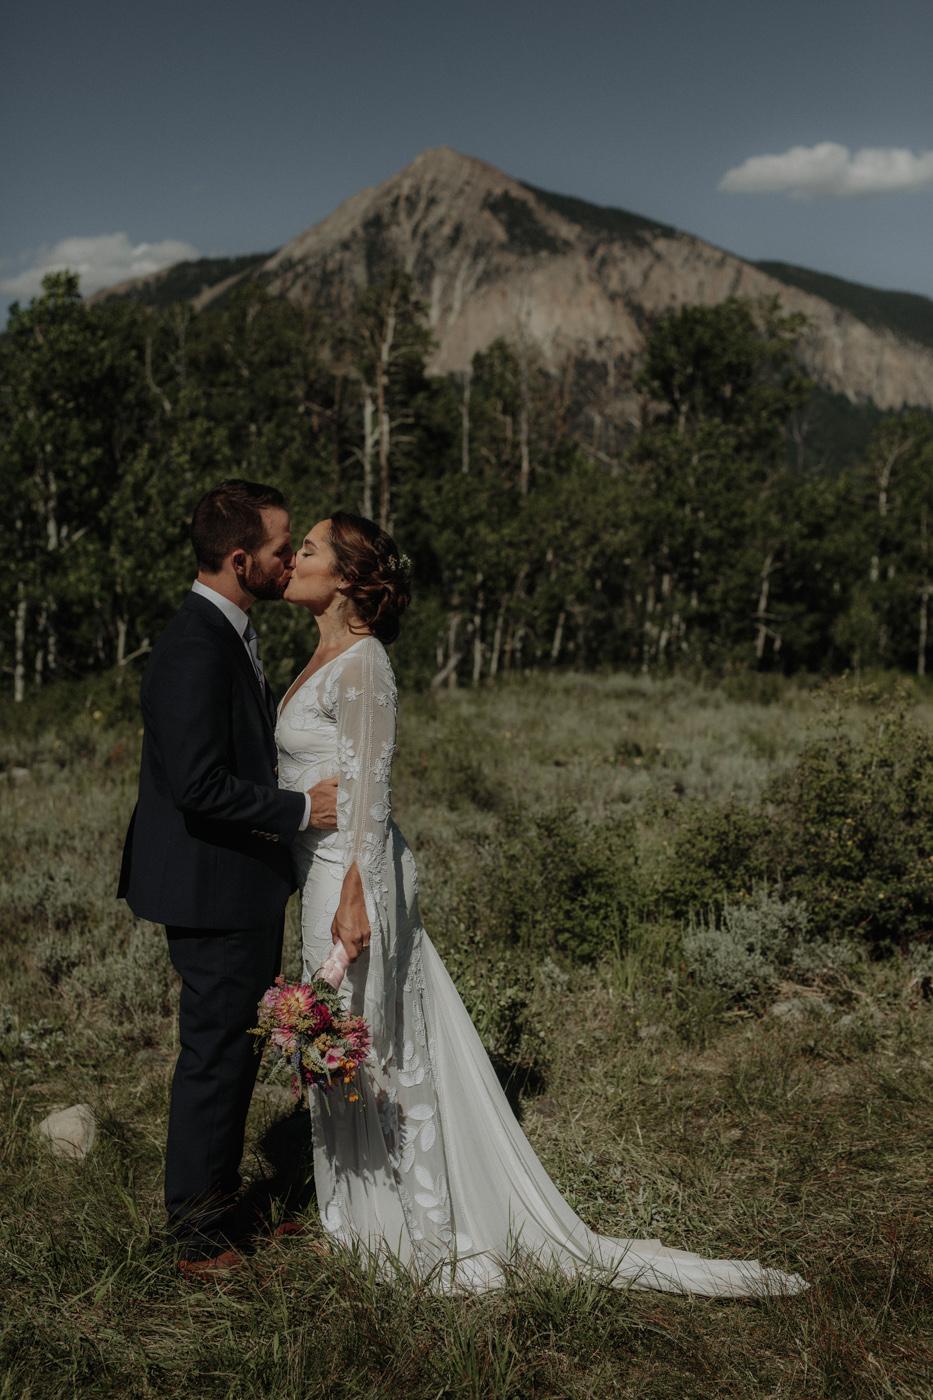 woods-walk-trail-crested-butte-colorado-wedding-71.jpg